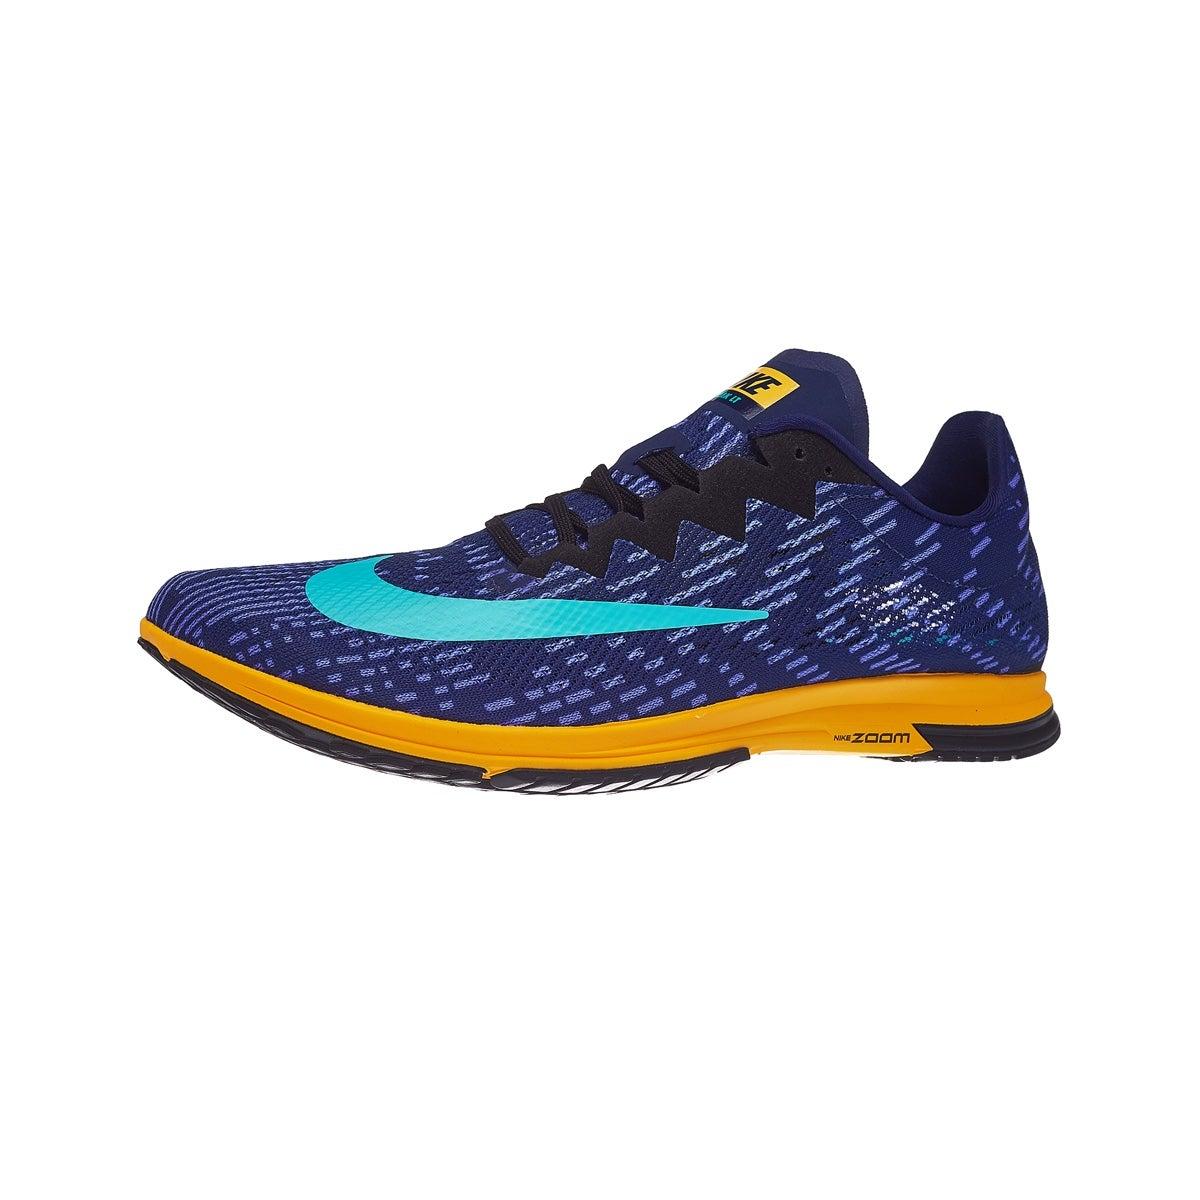 d6dbbd64f791 Nike Zoom Streak LT 4 Unisex Shoes Blue Void Jade 360° View ...